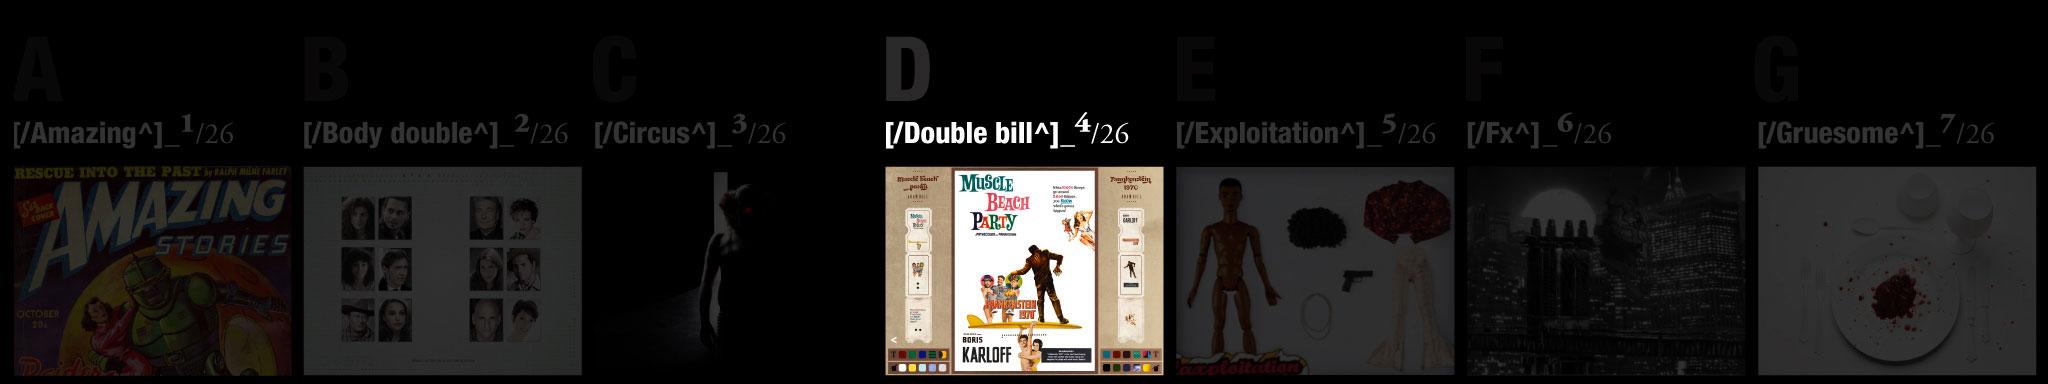 Tavola-sinottica_01_D-Double-Bill